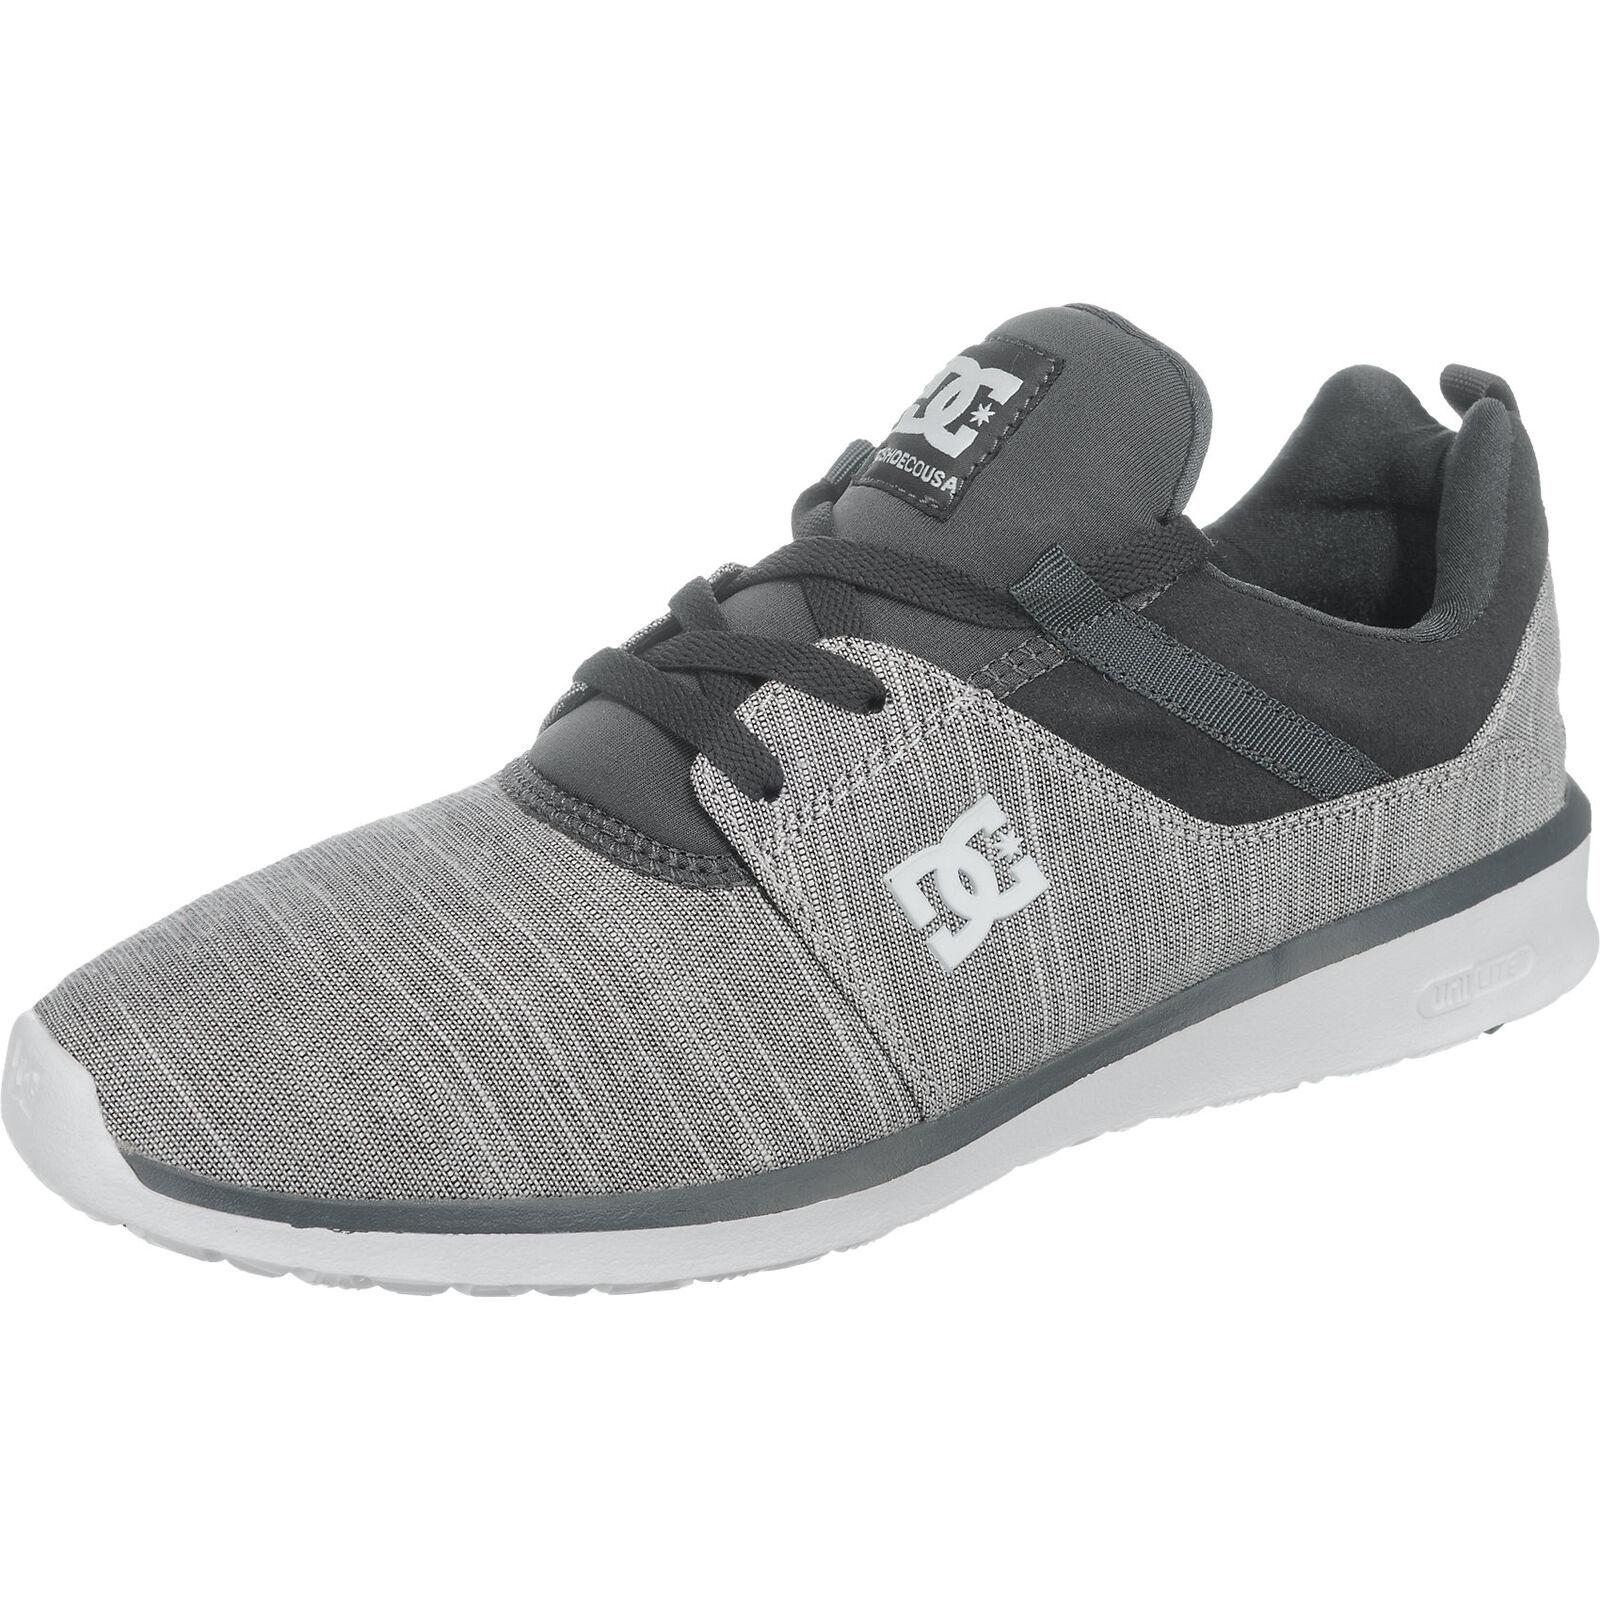 Neu DC Shoes Heathrow Se Sneakers grau-kombi 5771723